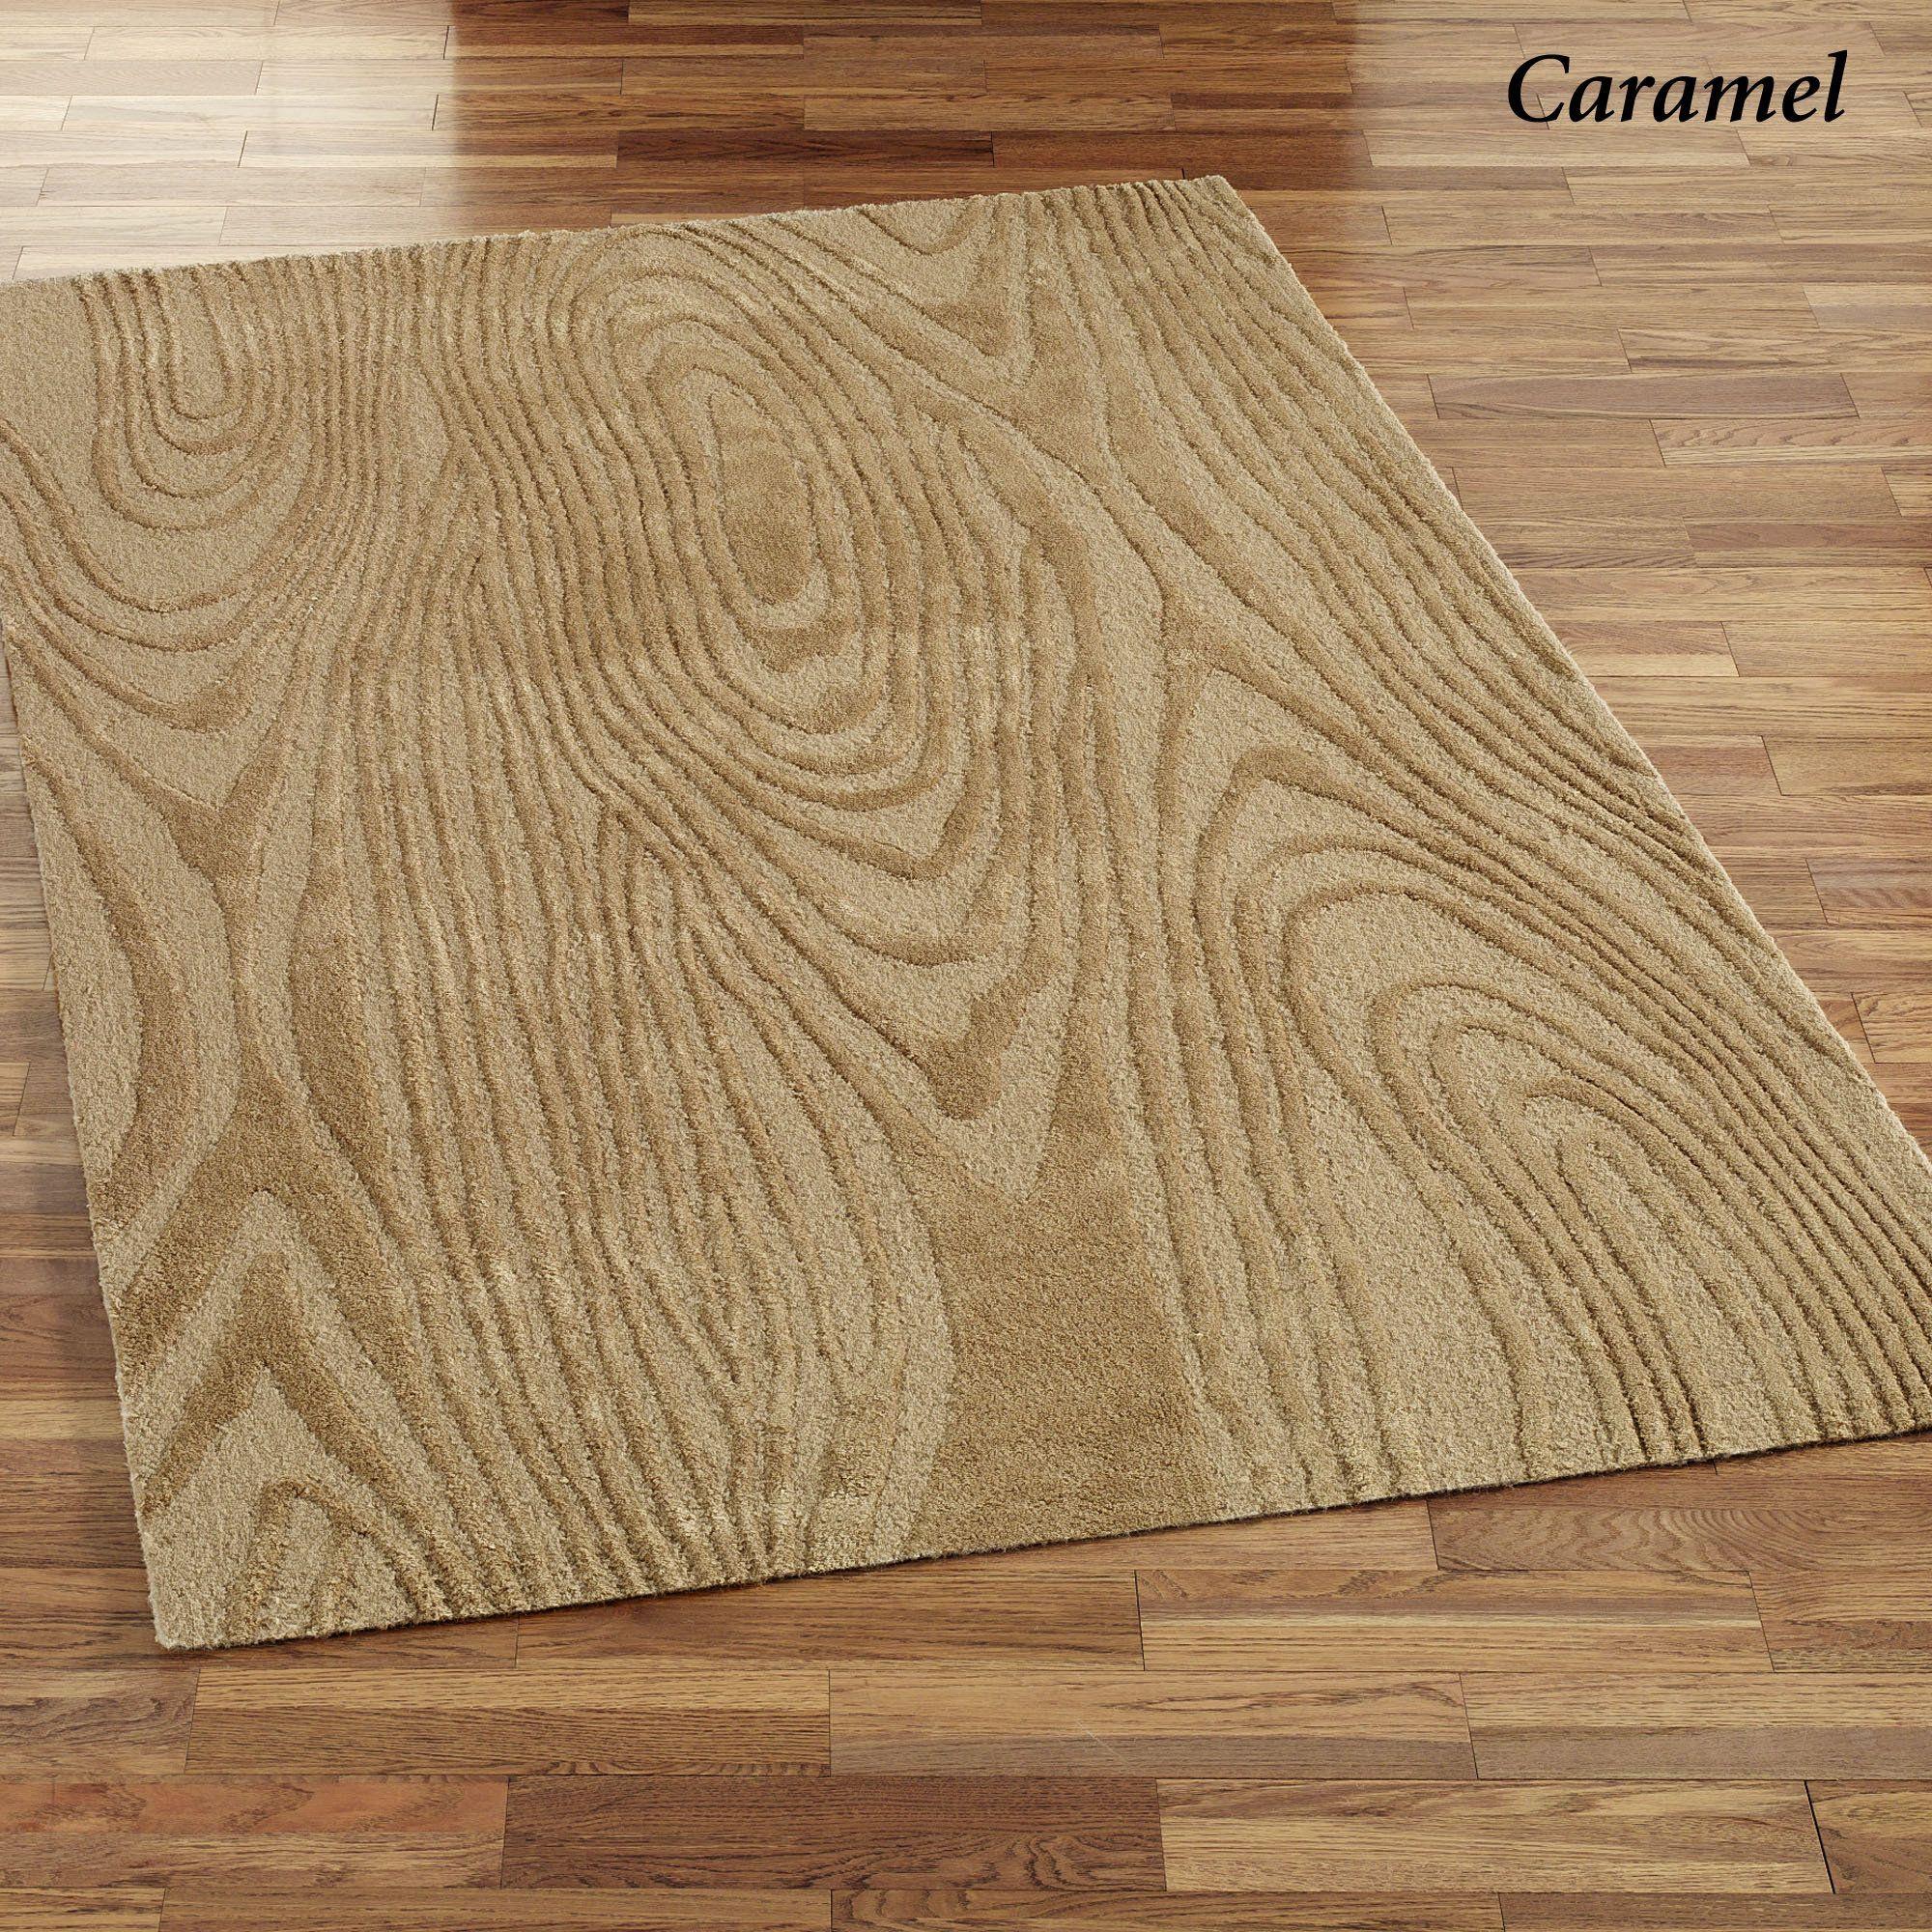 Wood Grain Print Rug: Wood Grain Design Coppice Area Rugs